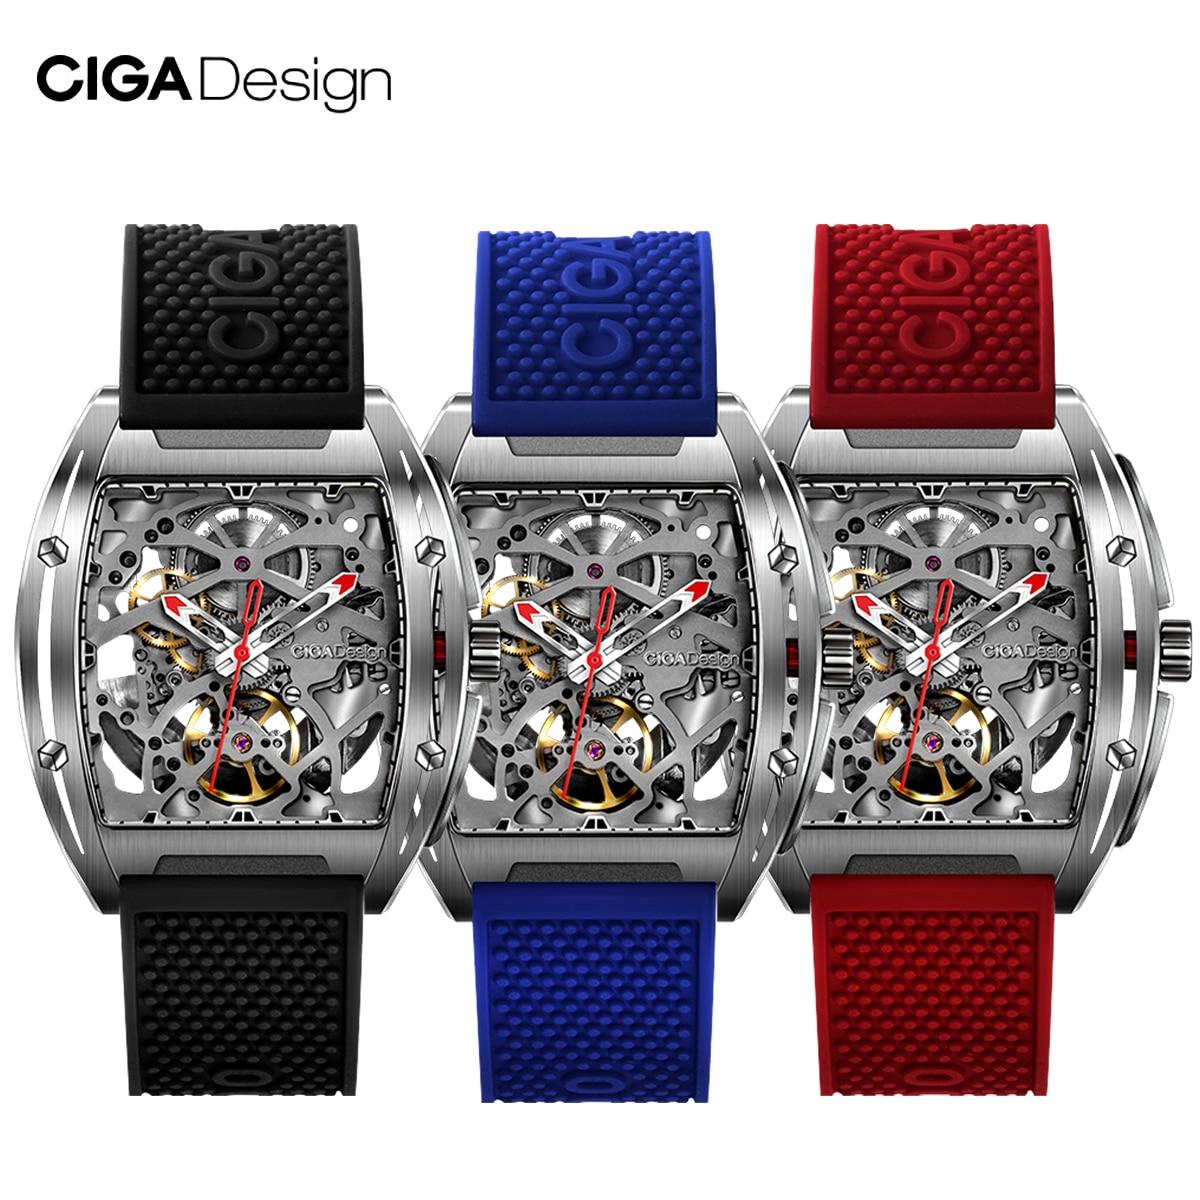 CIGA Design CIGA Watch Z Series Watch Barrel Type Double-Sided Hollow Automatic Skeleton Mechanical Men's Waterproof Watch(China)